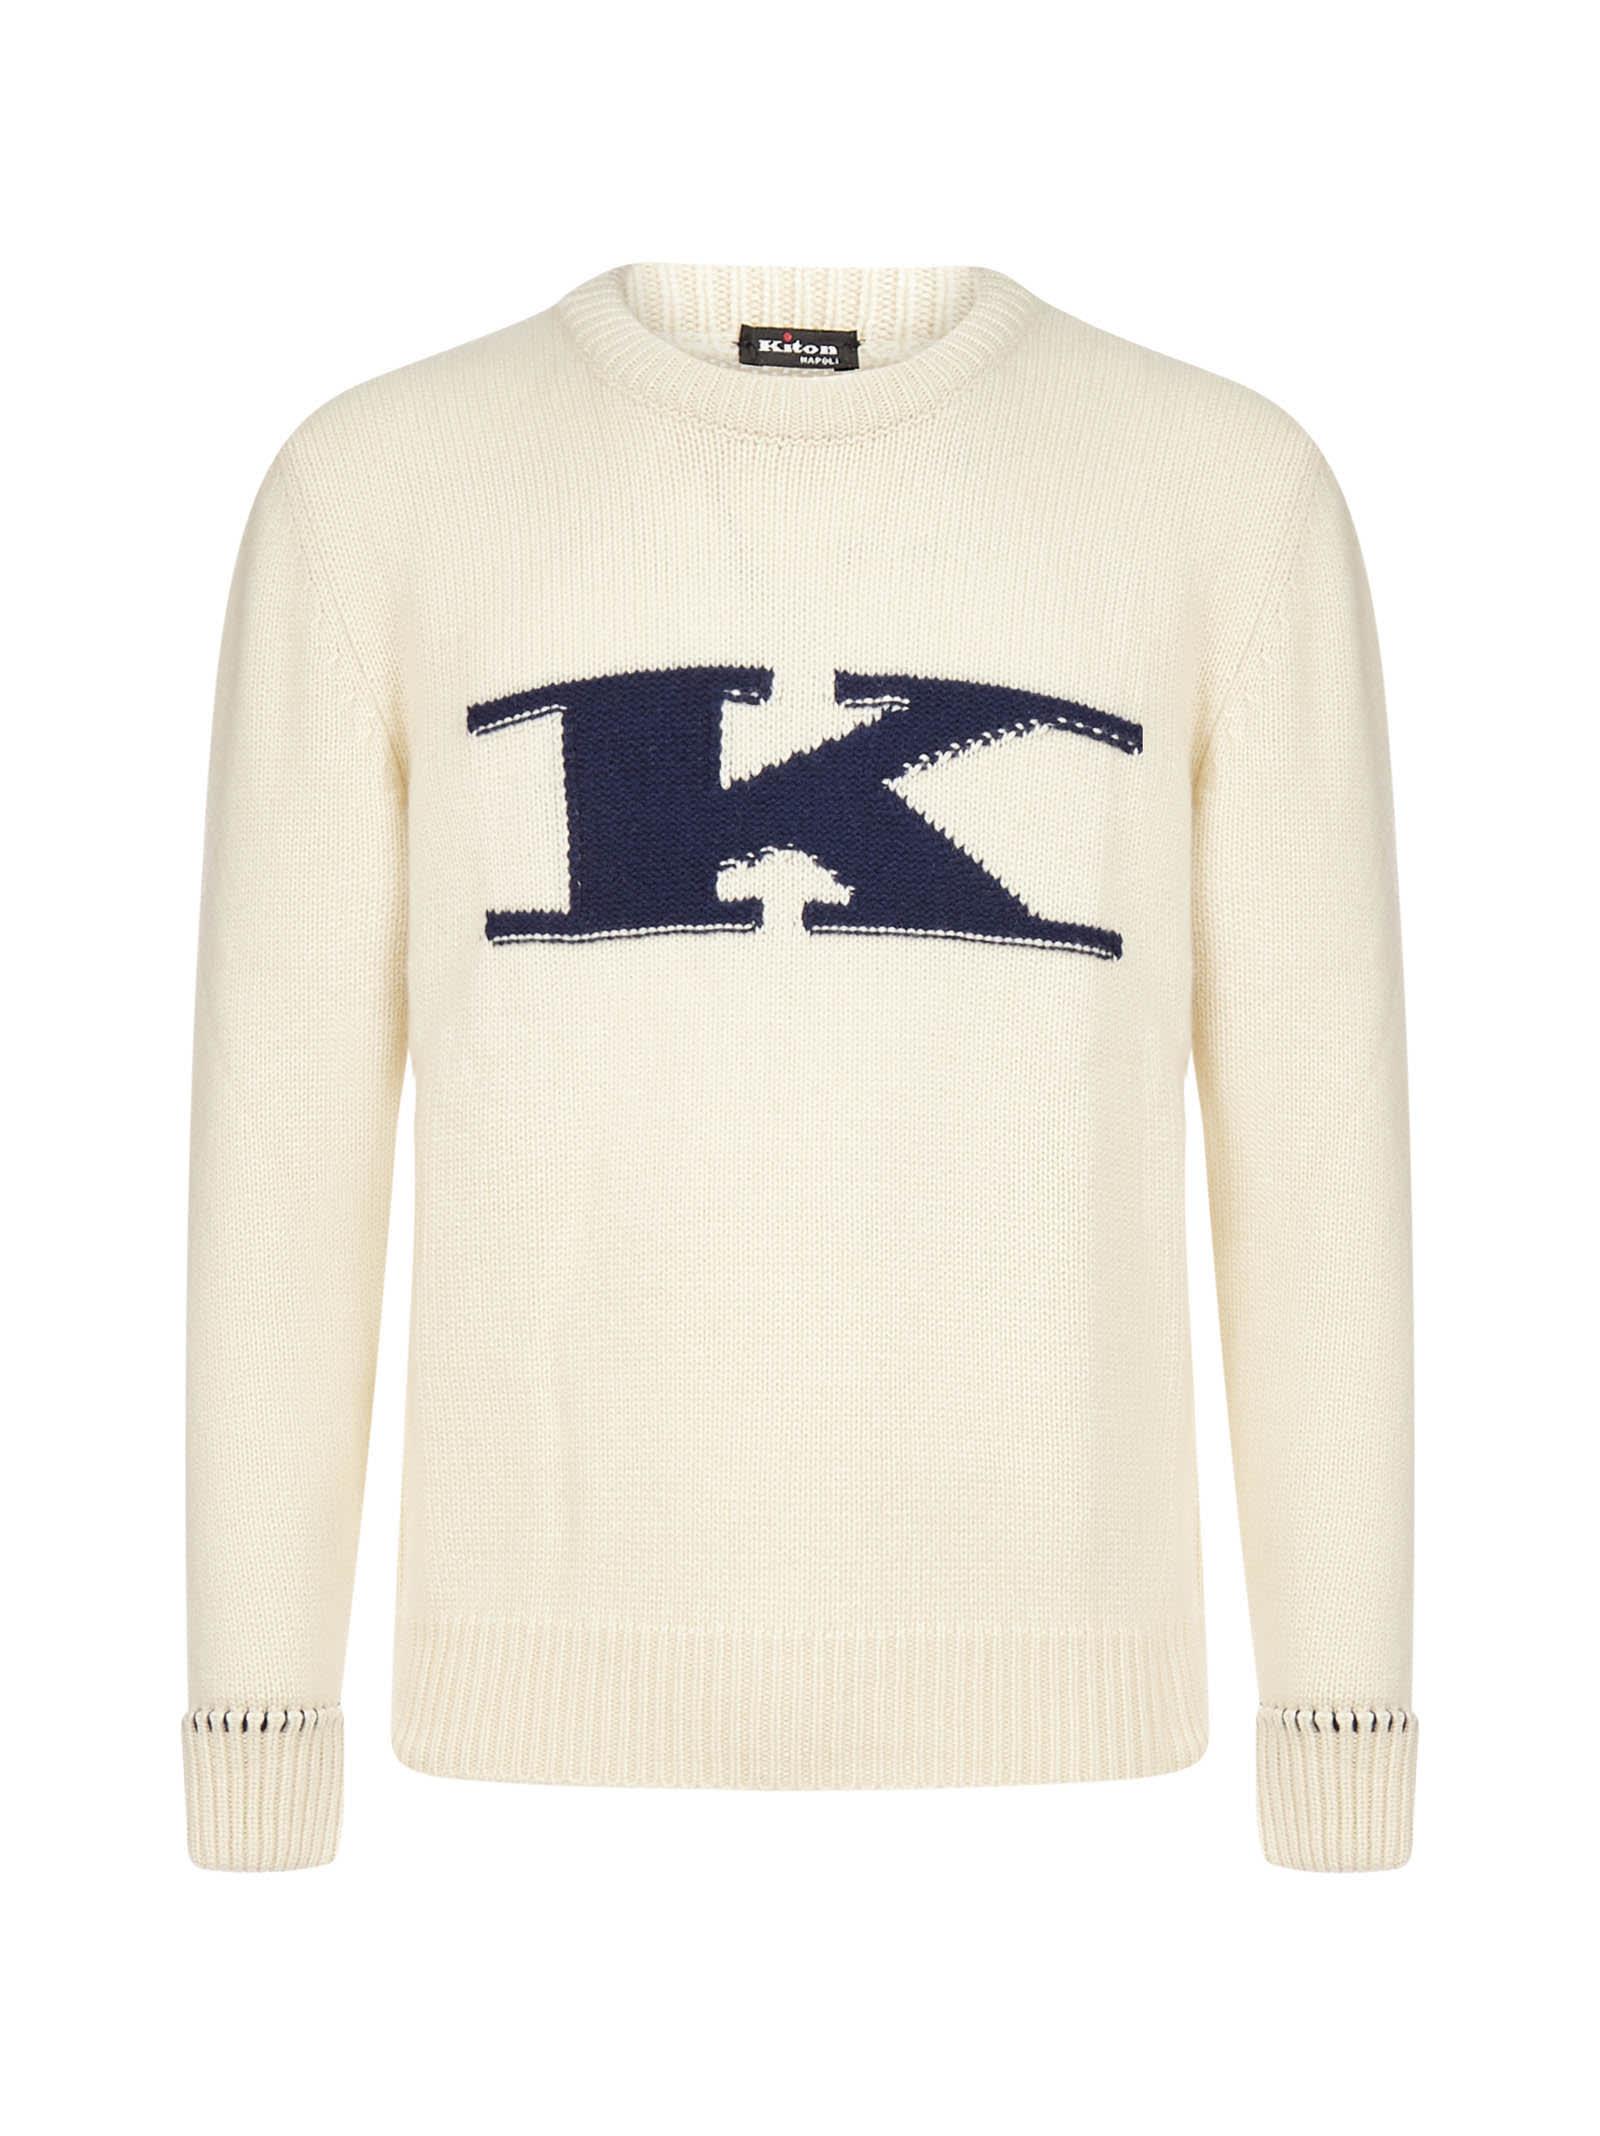 Kiton Logo Cashmere Sweater